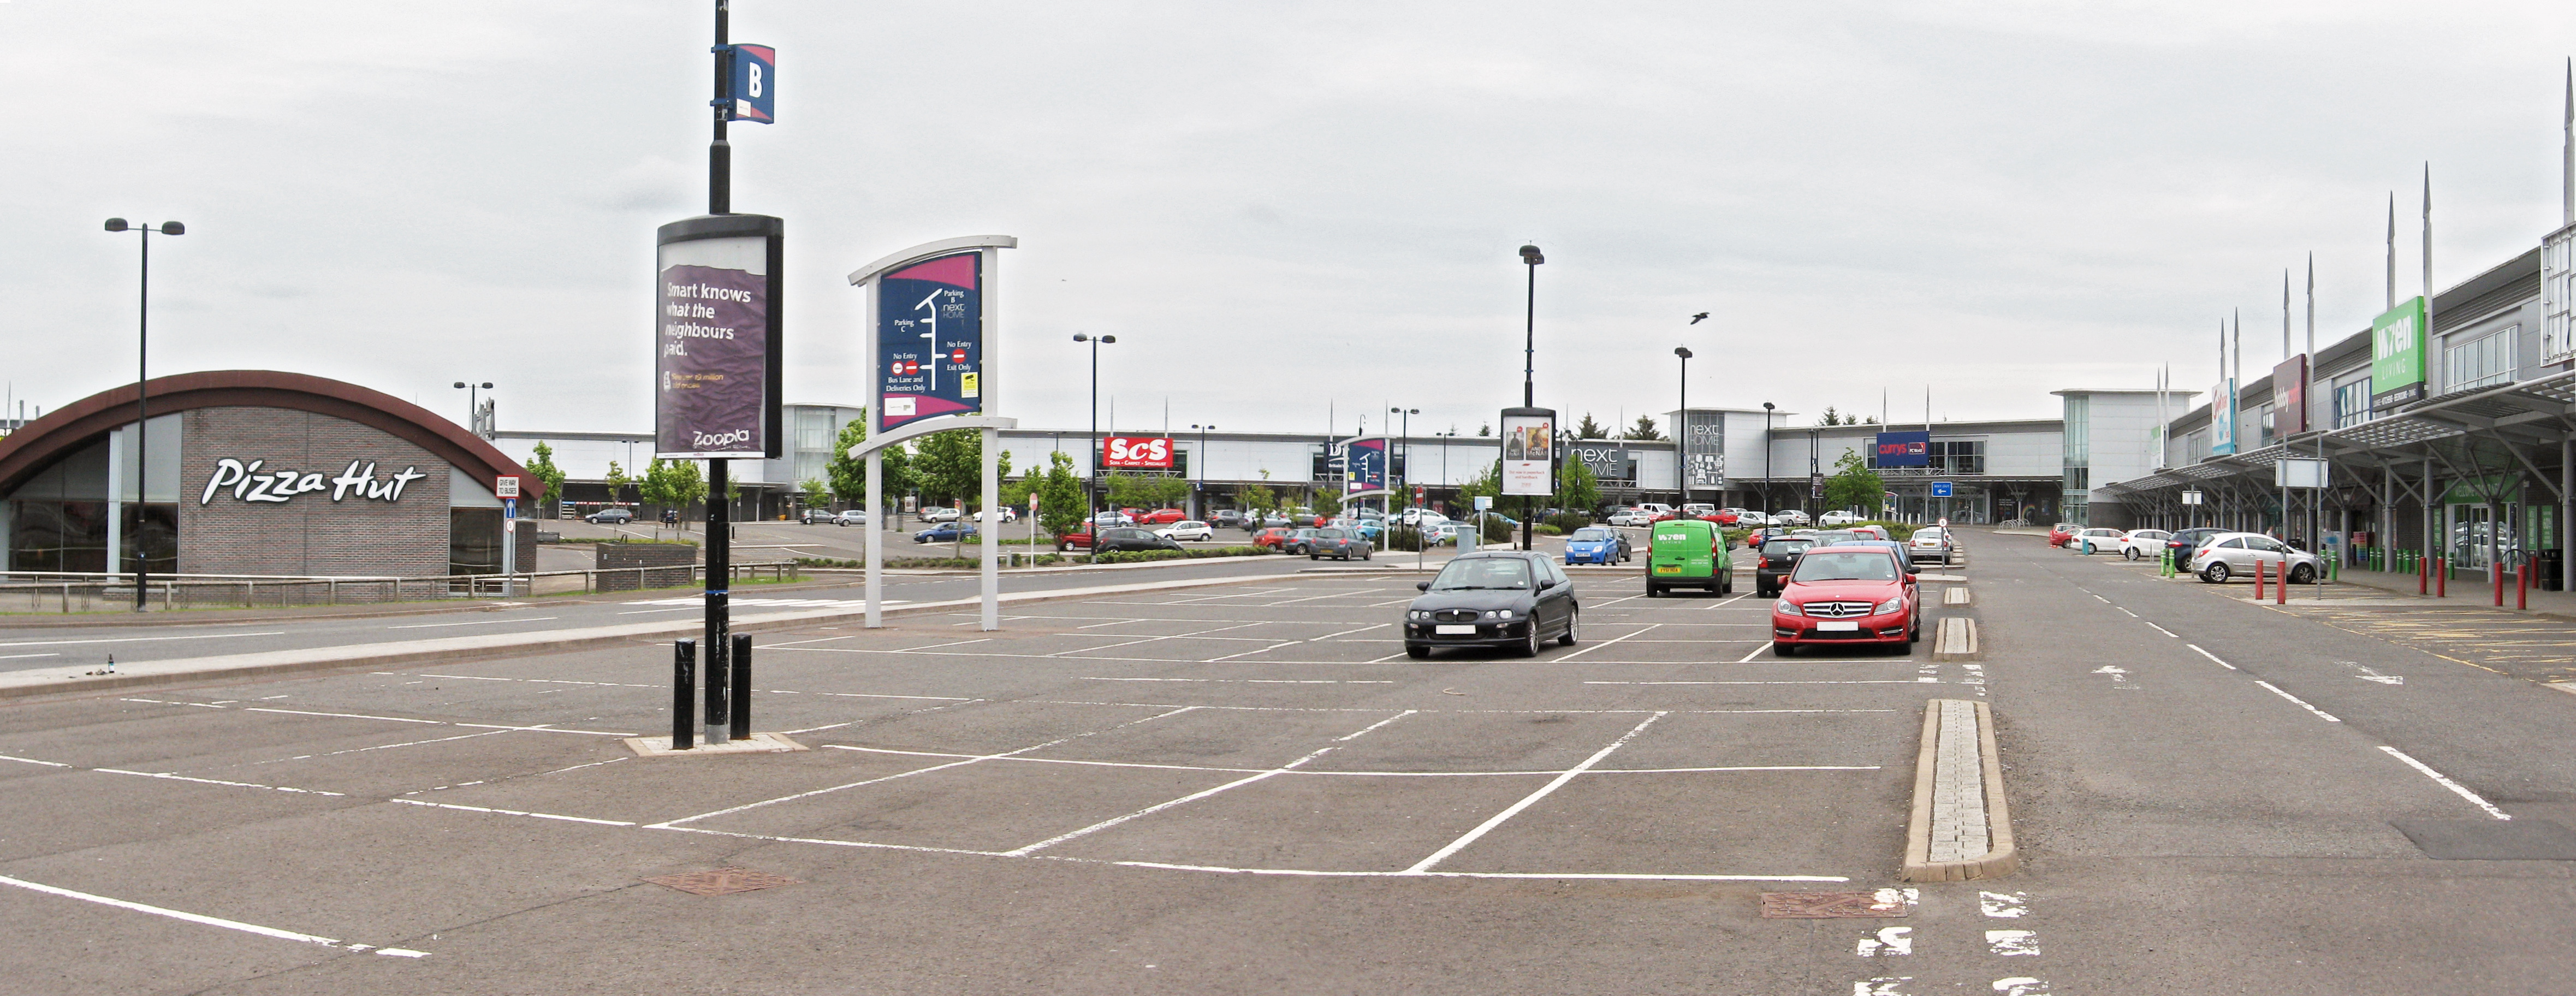 Car Park Closest To Wembley Level  Seats A